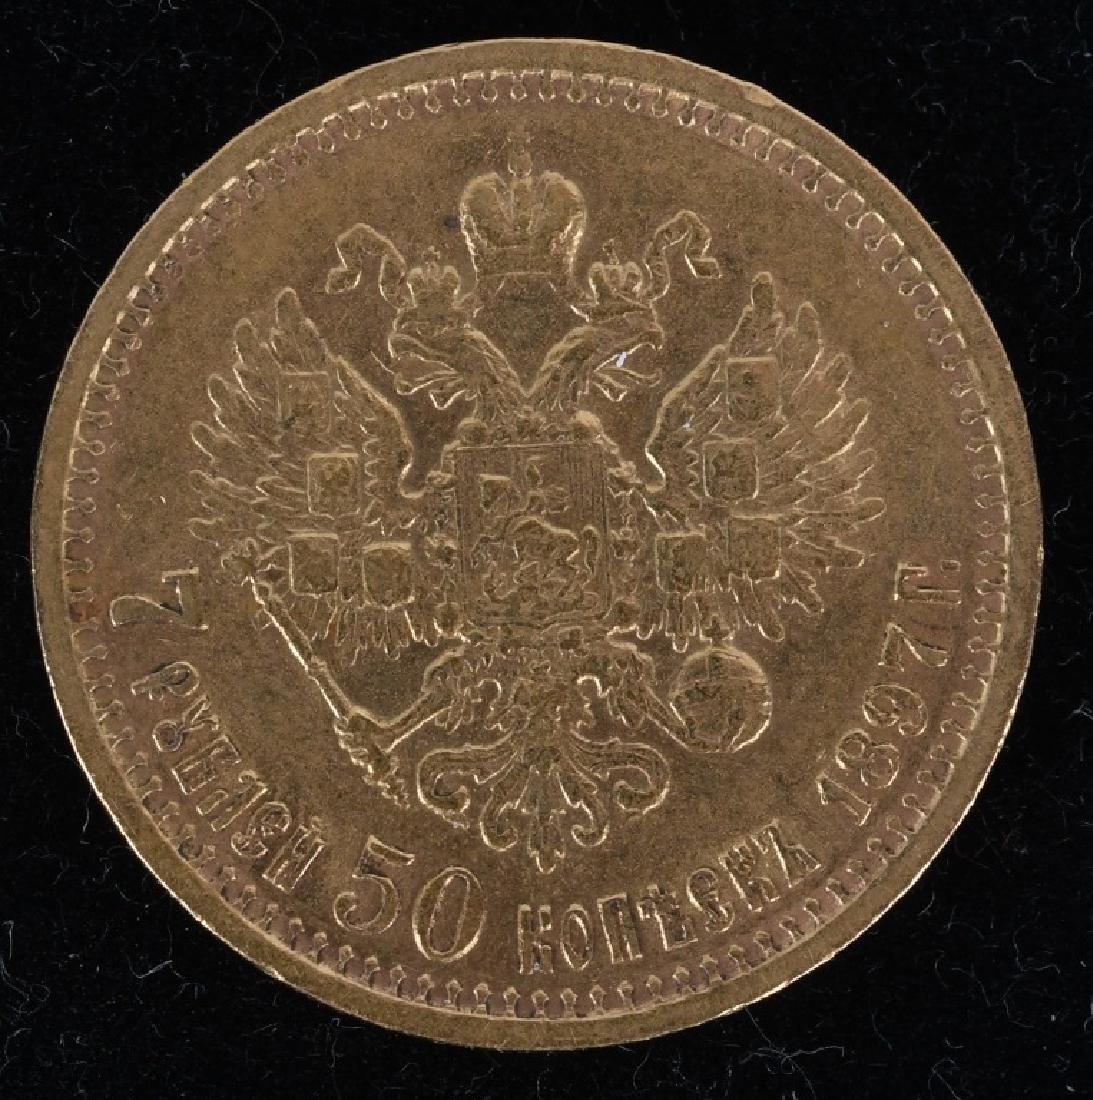 1897 Russia Gold 7 Roubles/50 Kopeks Nicholas II - 2